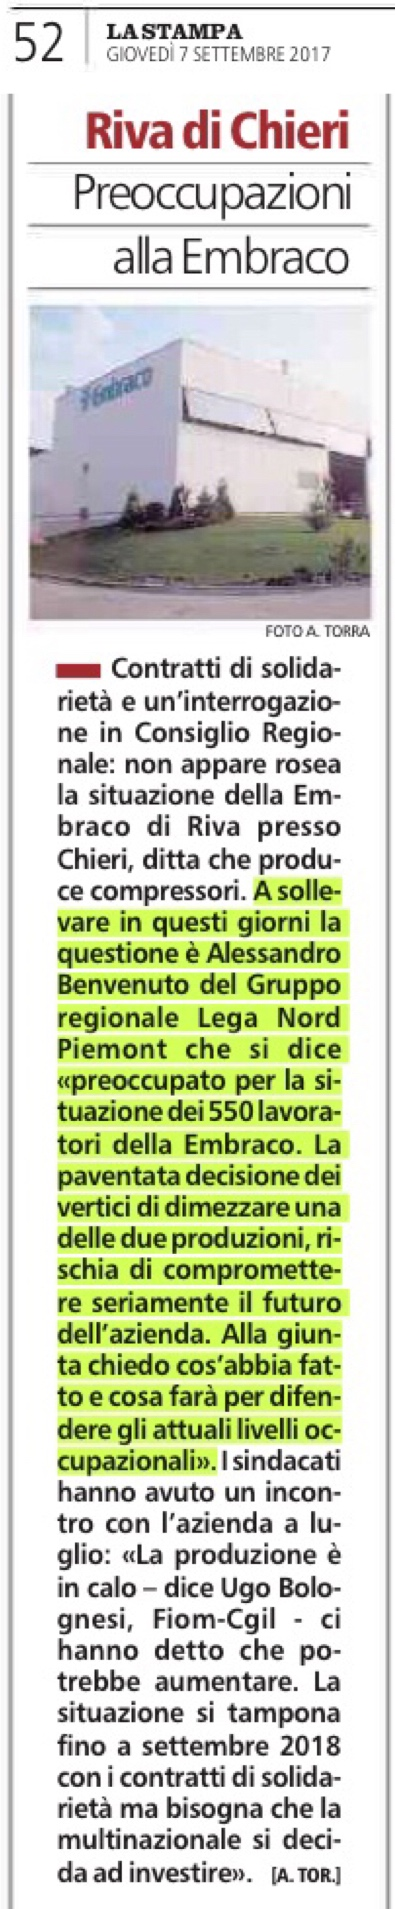 La Stampa, 07.09.2017